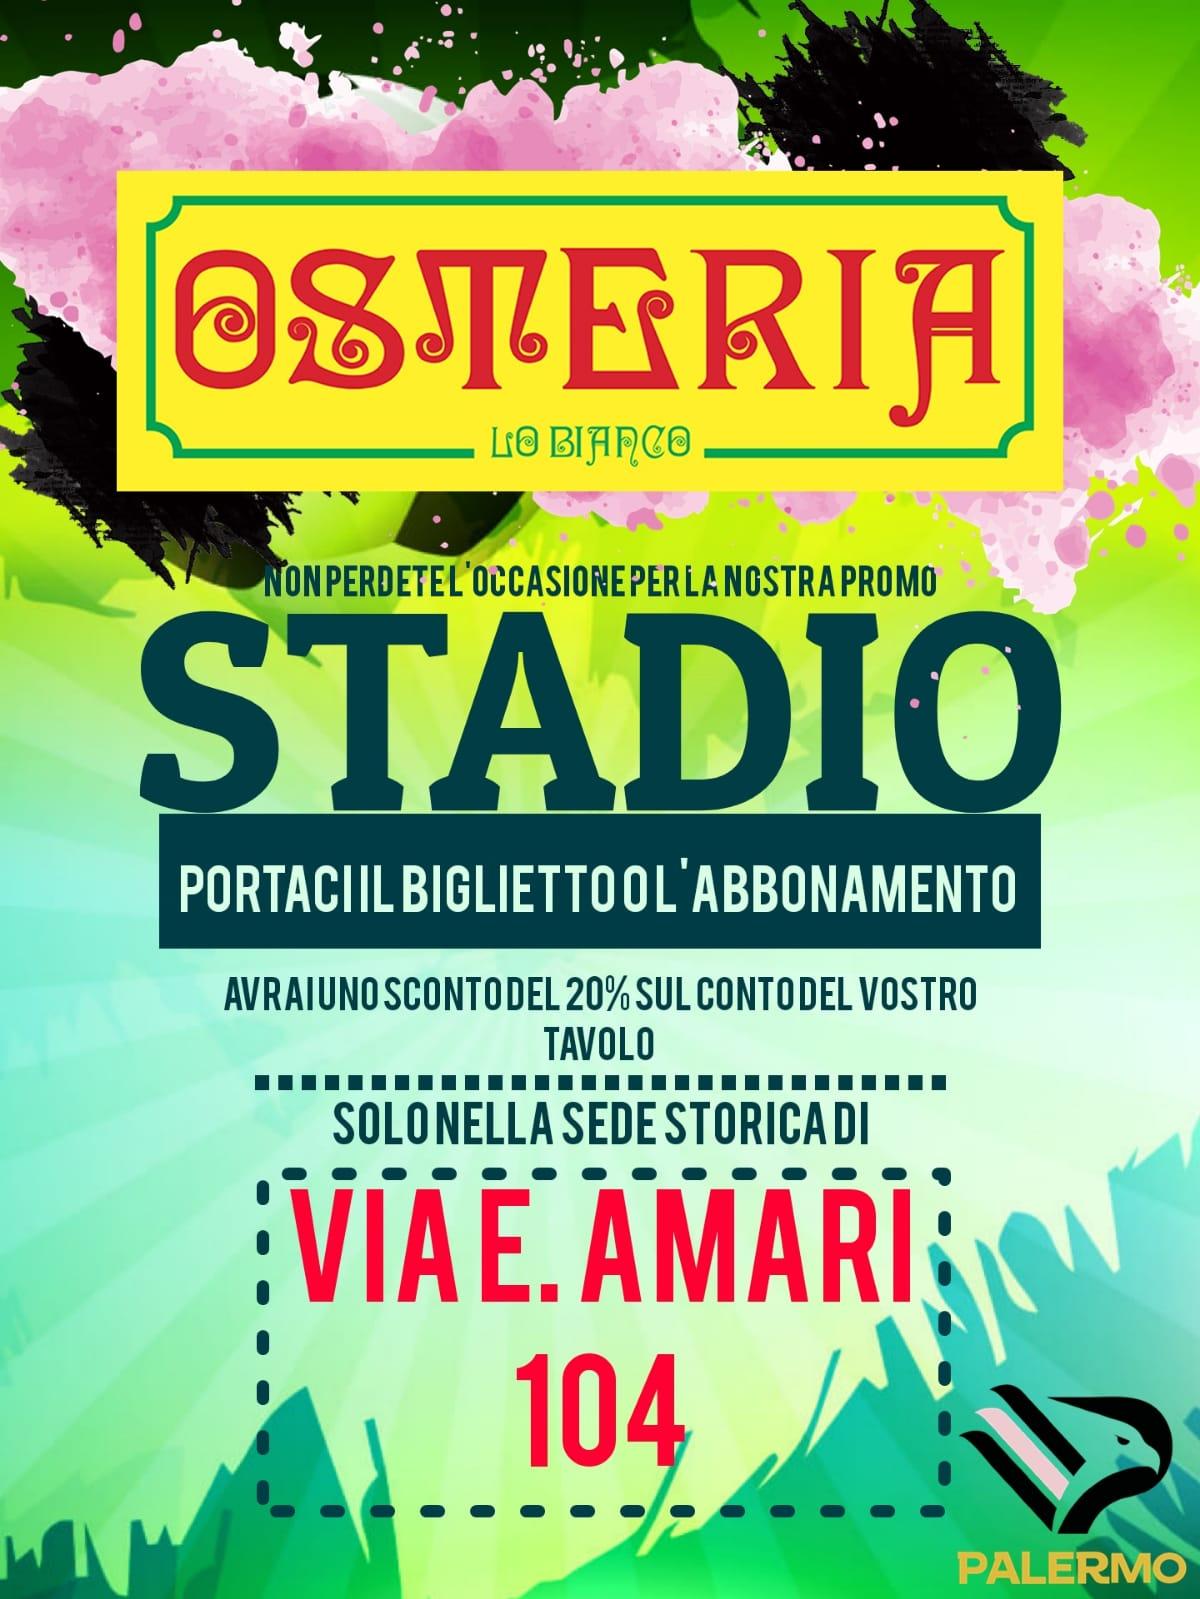 promo_osteria_lo_bianco_stadio